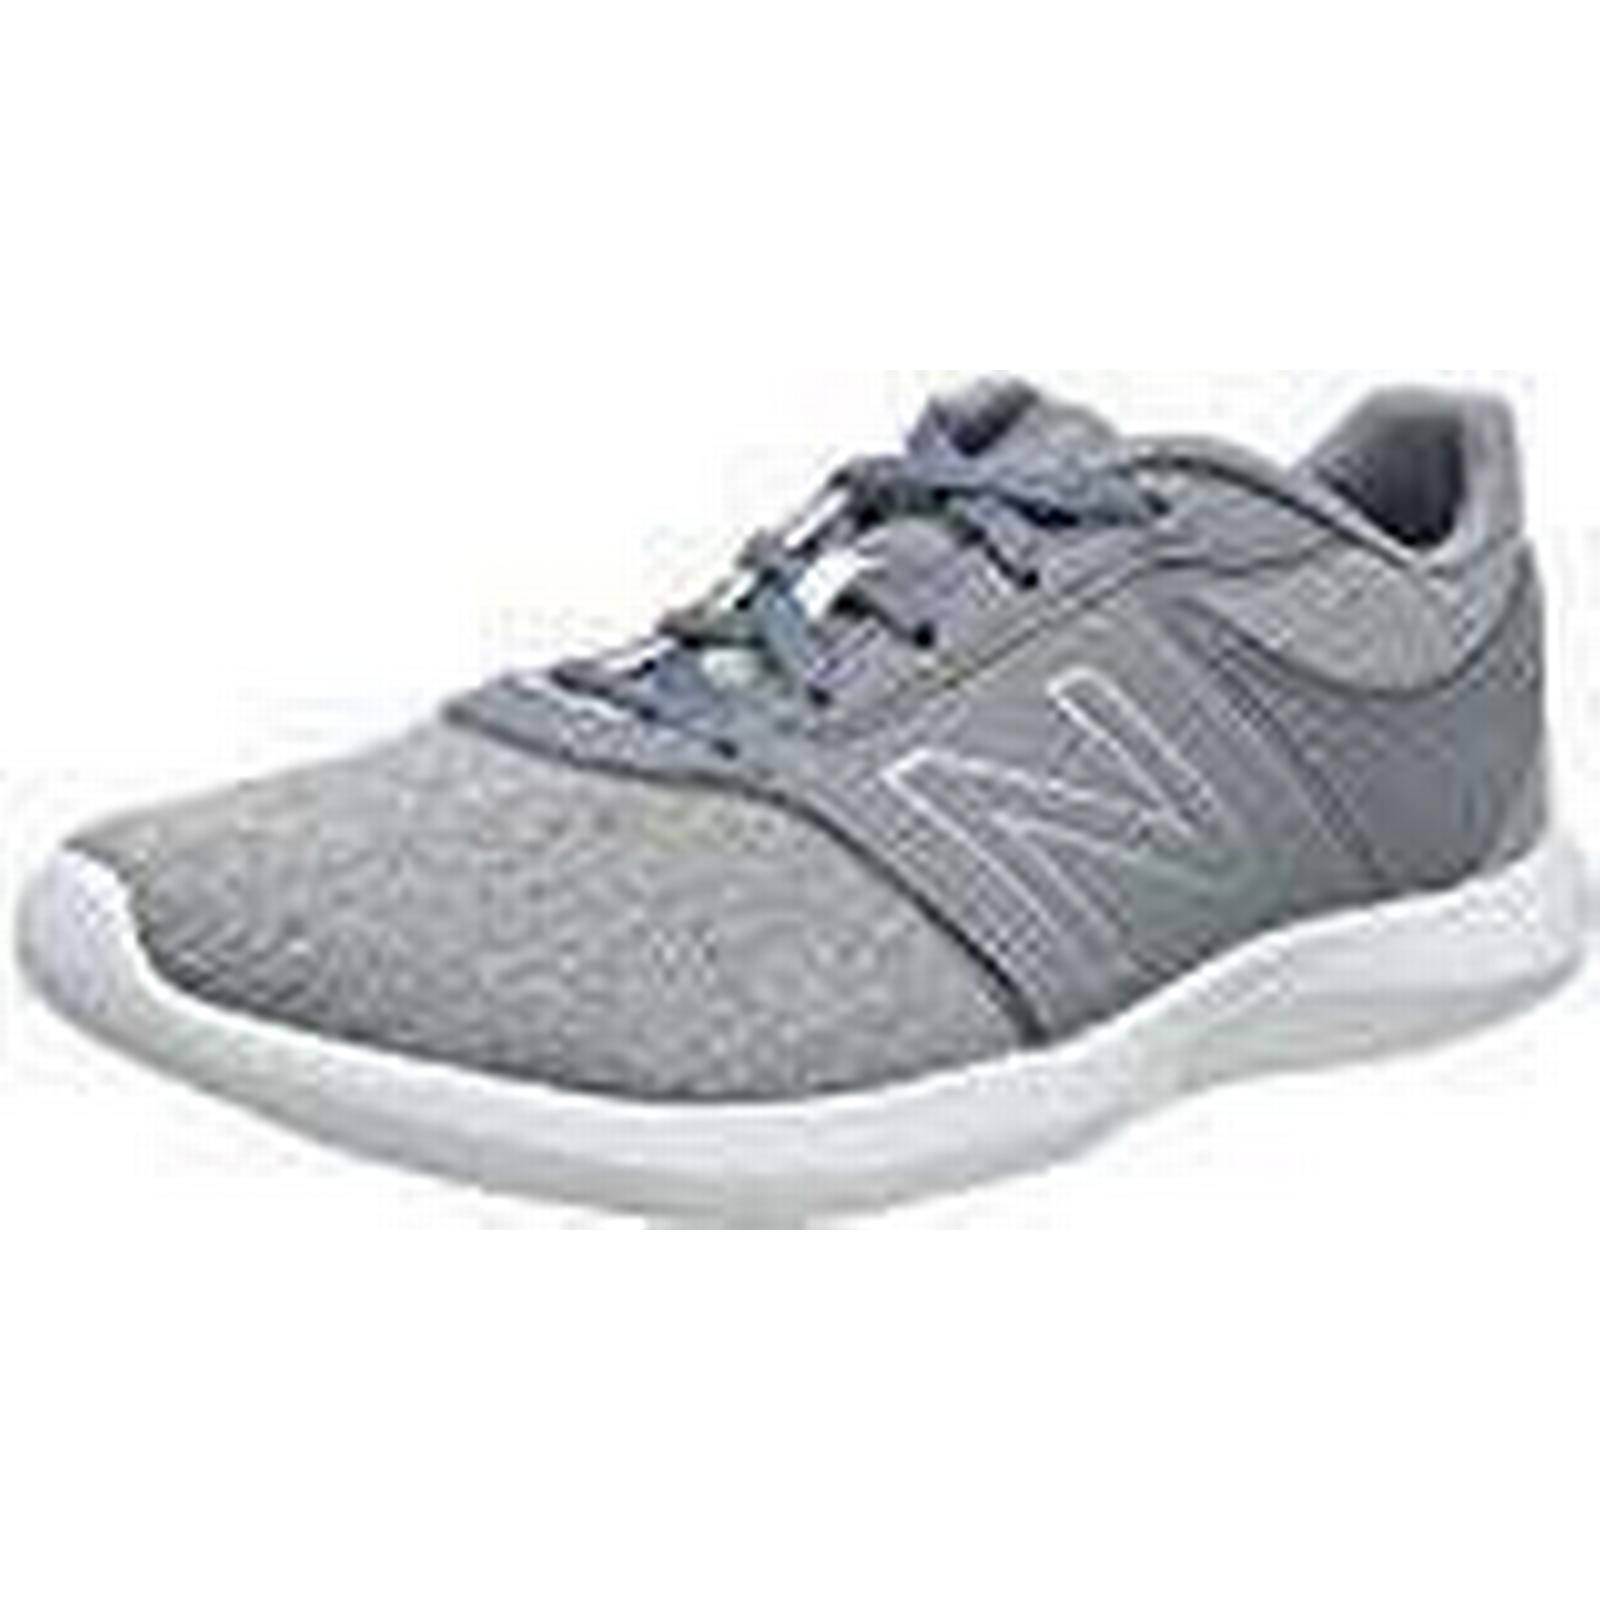 New Balance Women Wl415V1 7 Fitness Shoes, Grey (Grey), 7 Wl415V1 UK (40.5 EU) c4140a